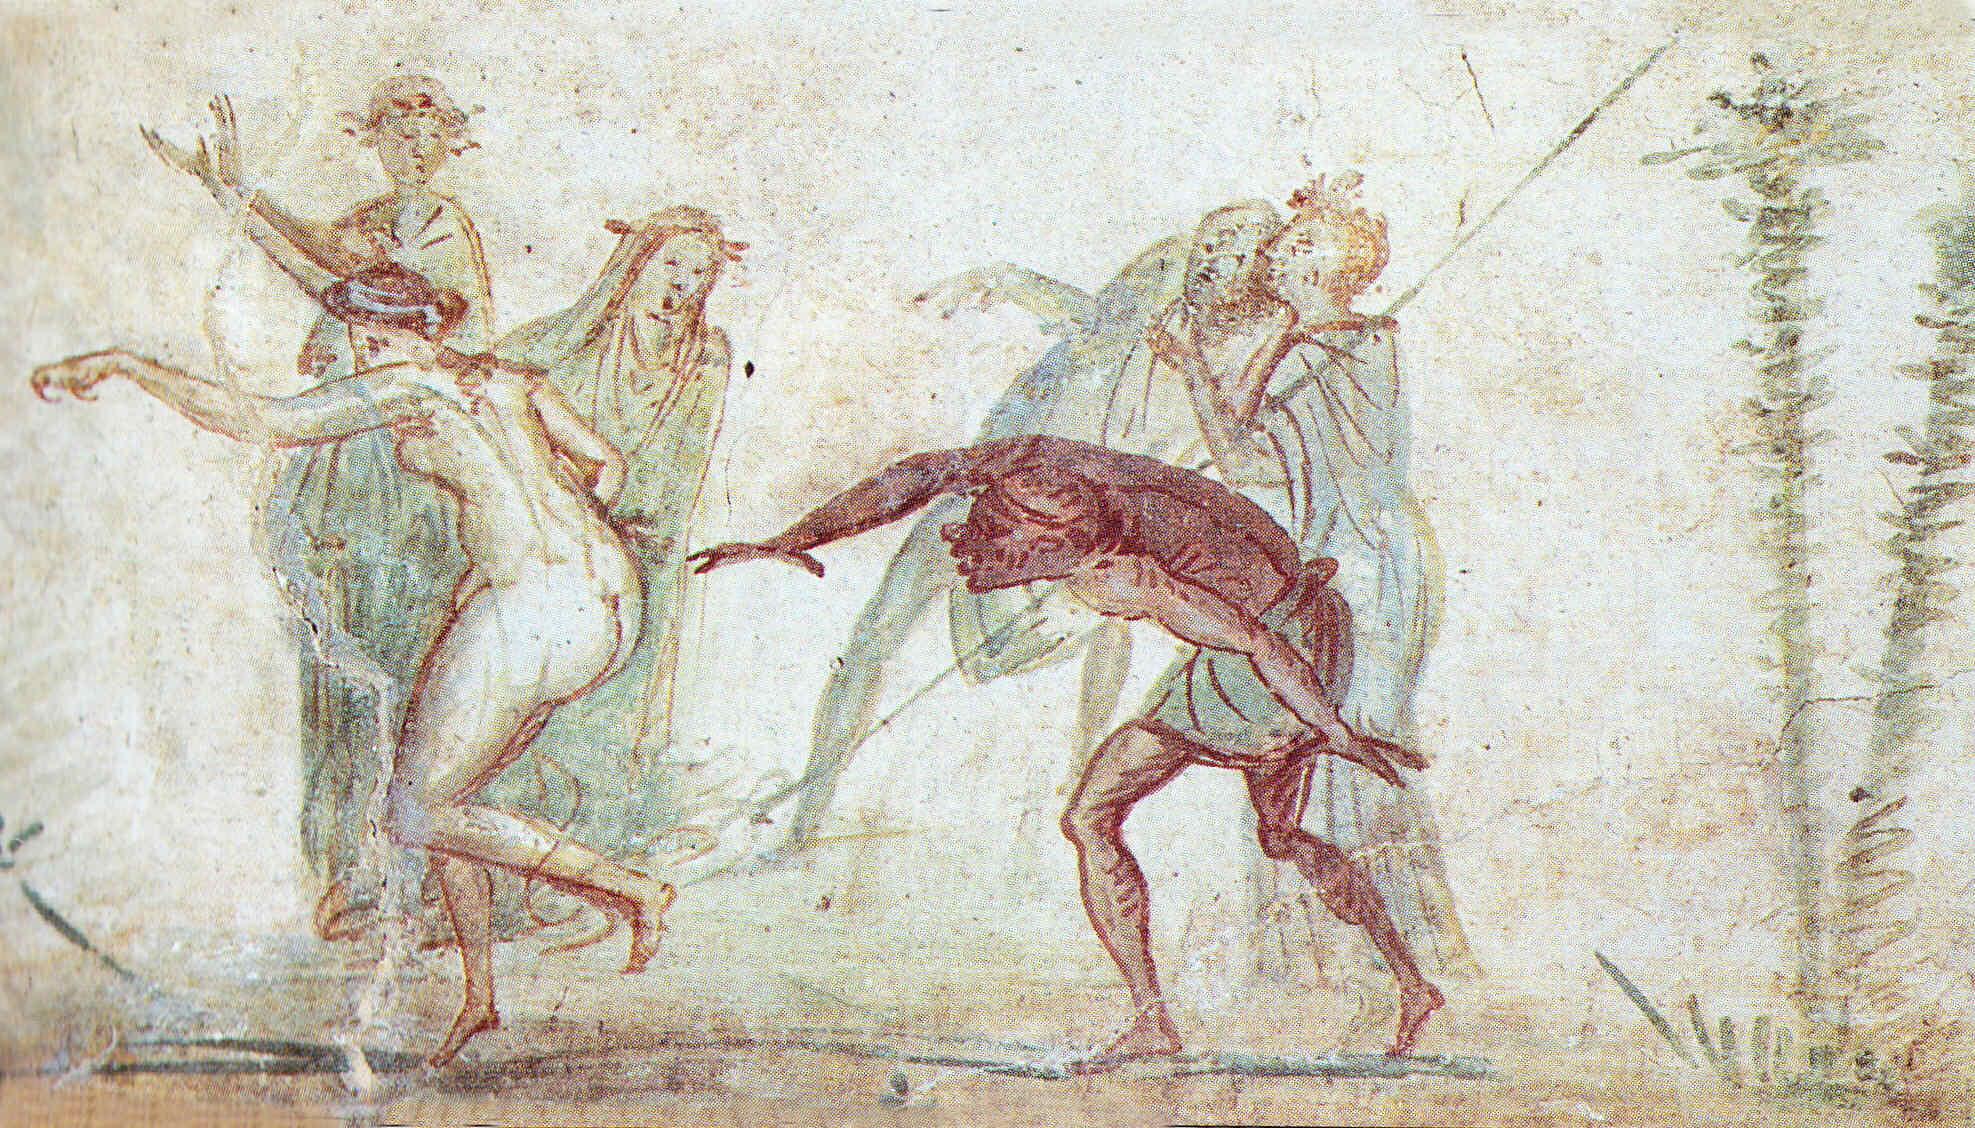 Egipto Antiguo 189 Las ventajas del legionario romano